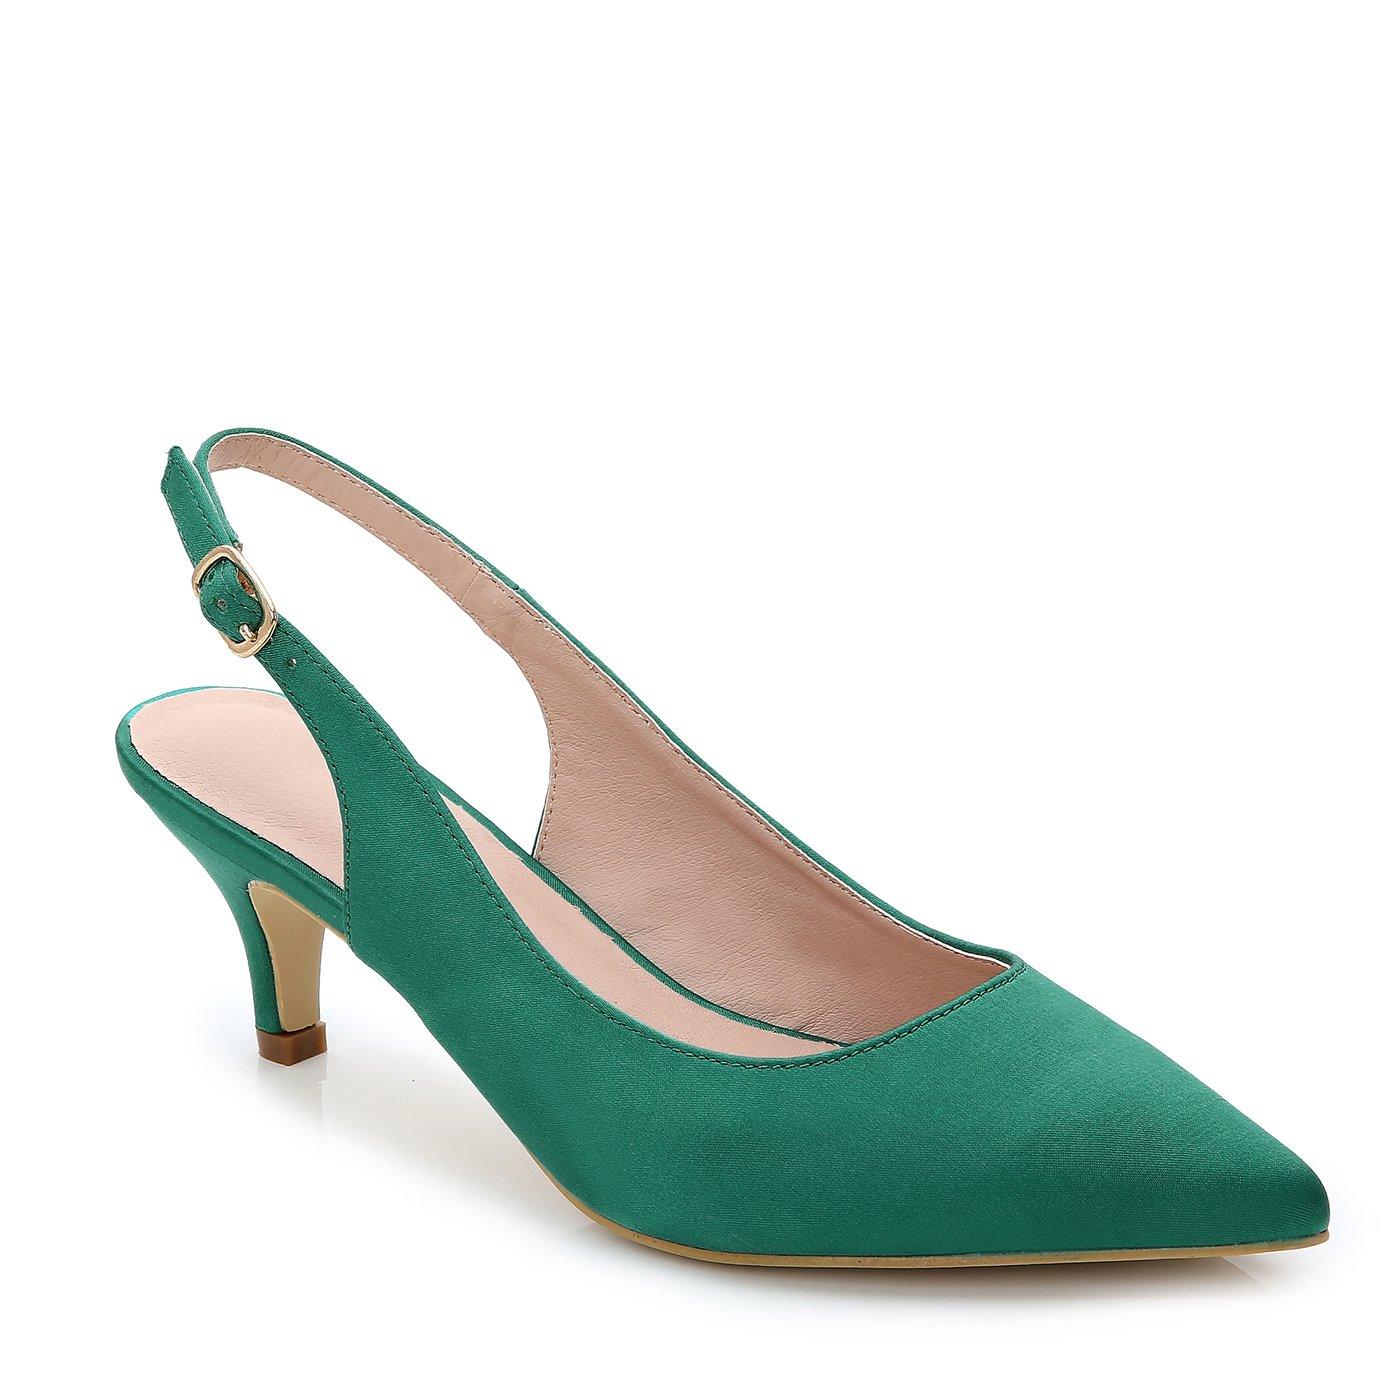 ComeShun Green Womens Comfort Low Heels Adjustable Buckle Slip On Dress Pumps Shoes Size 10